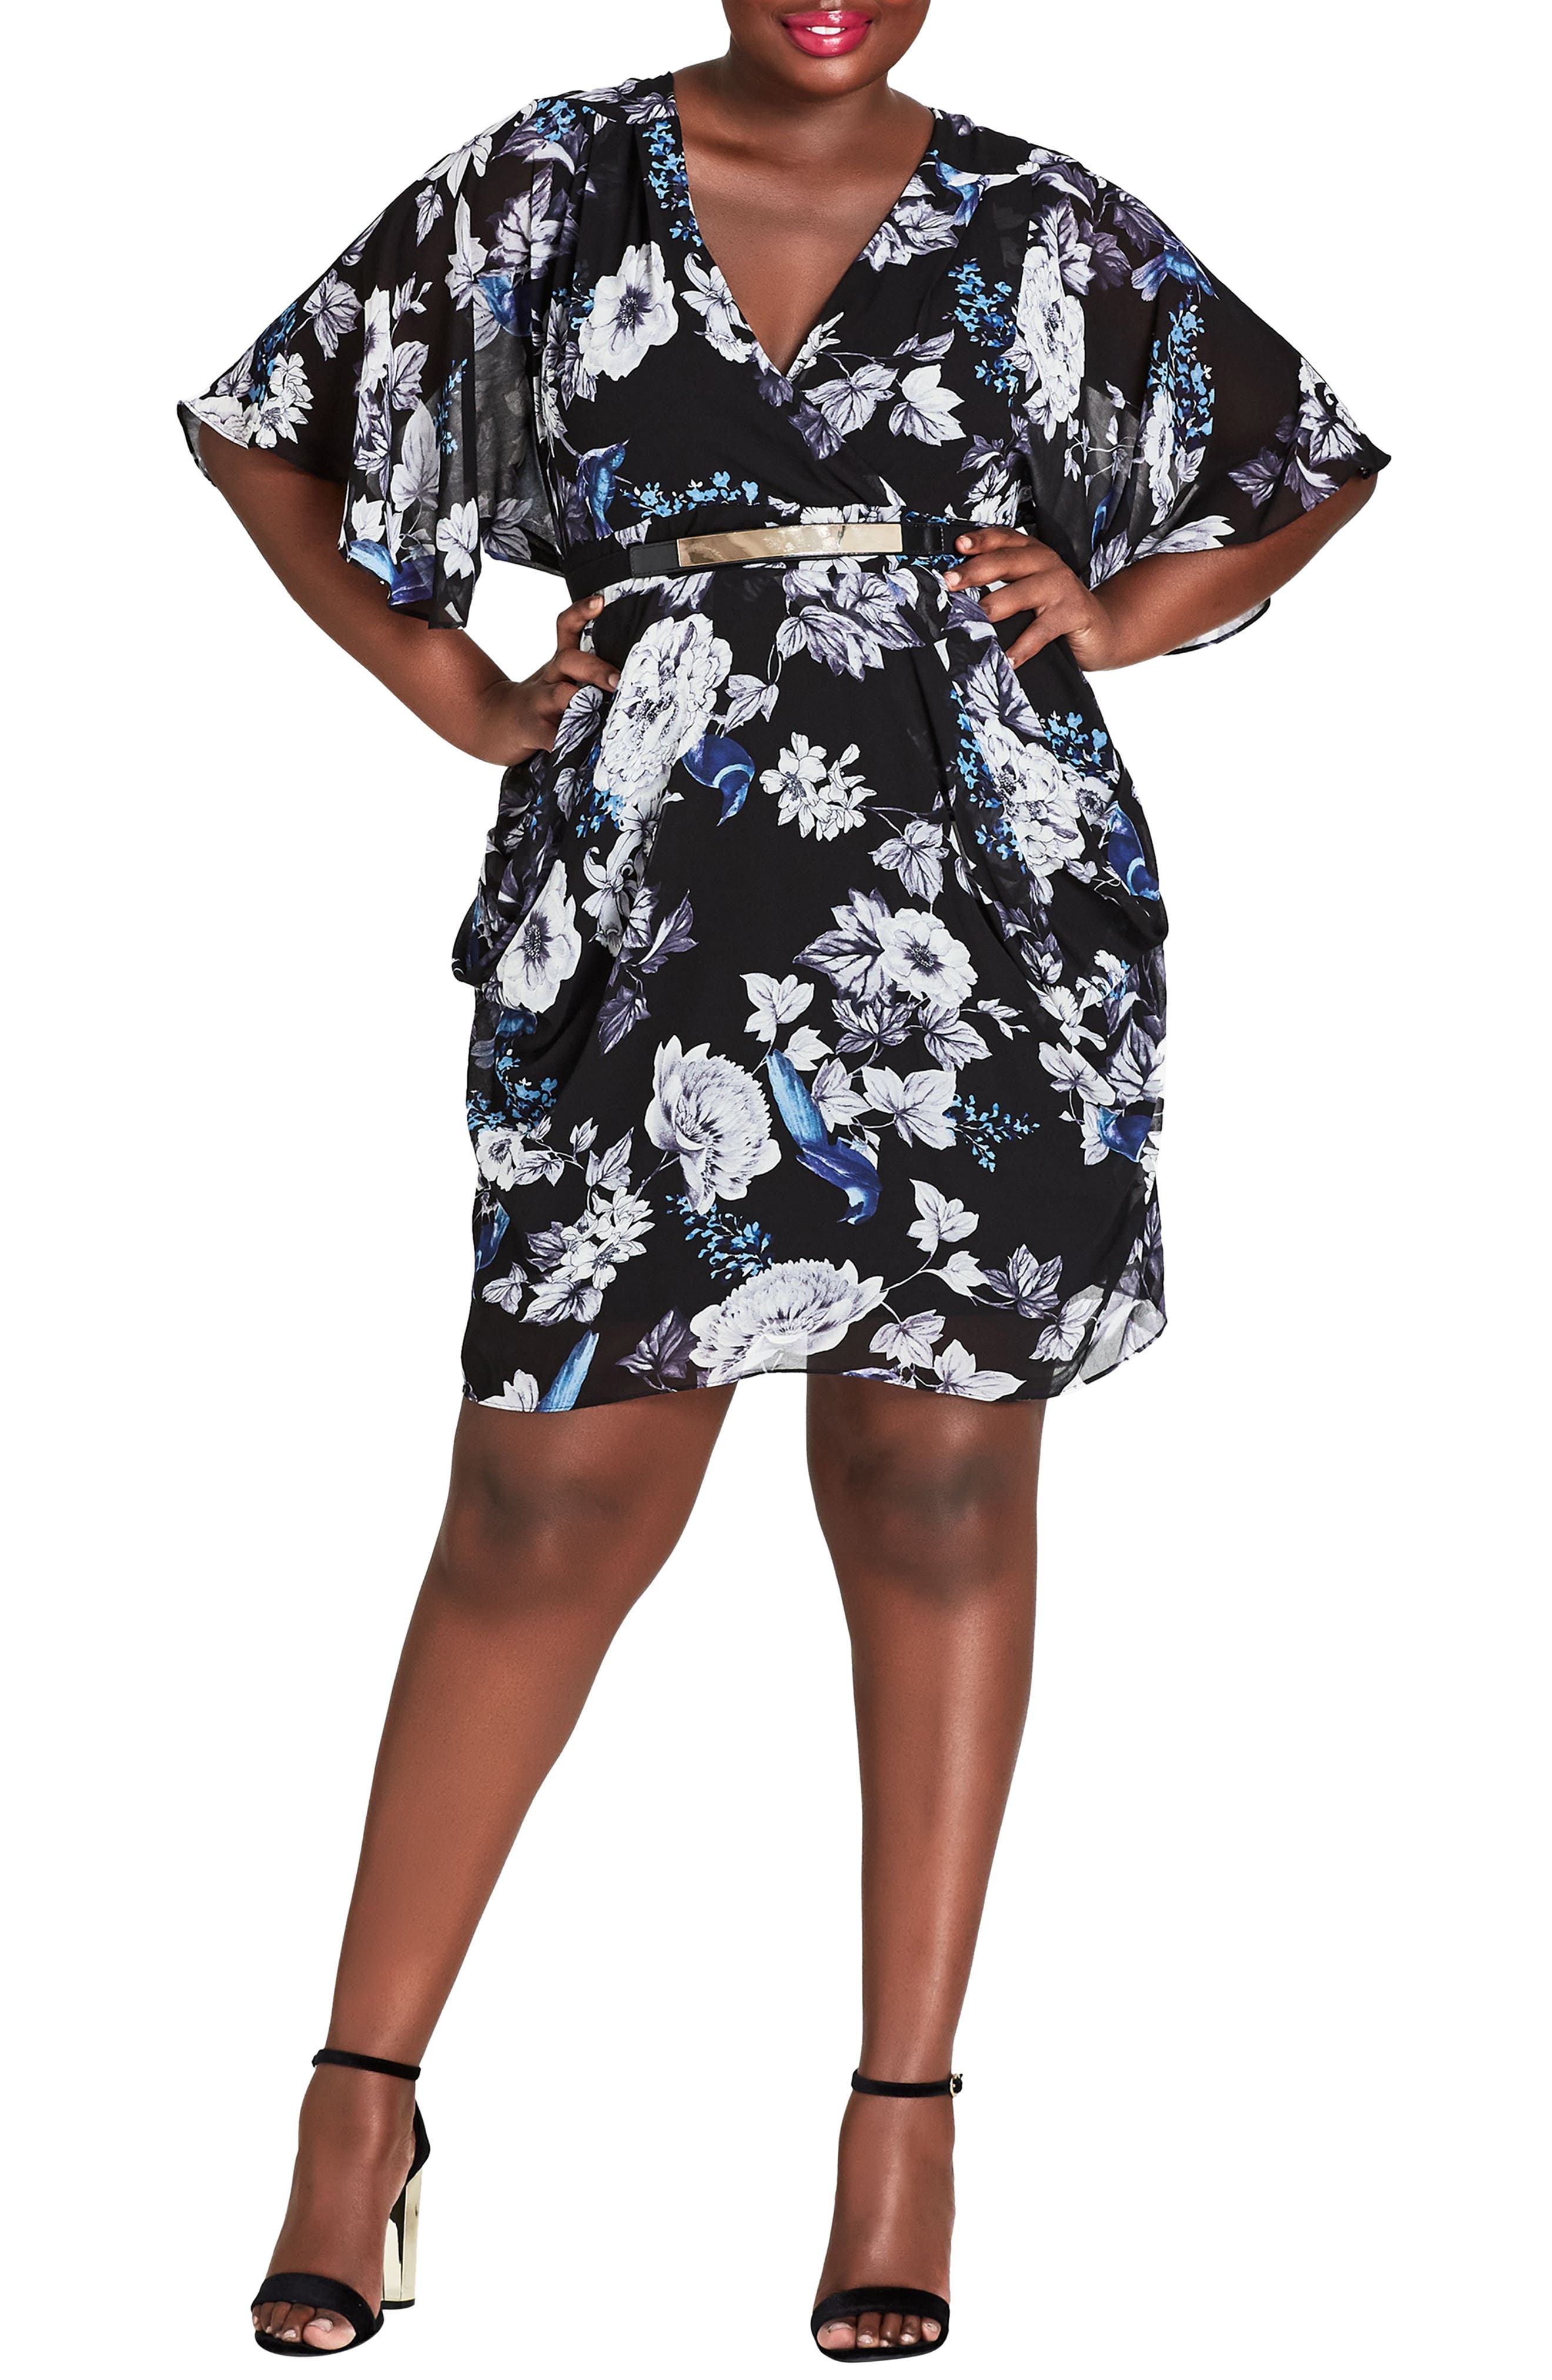 Plus Size City Chic Blackbird Dress